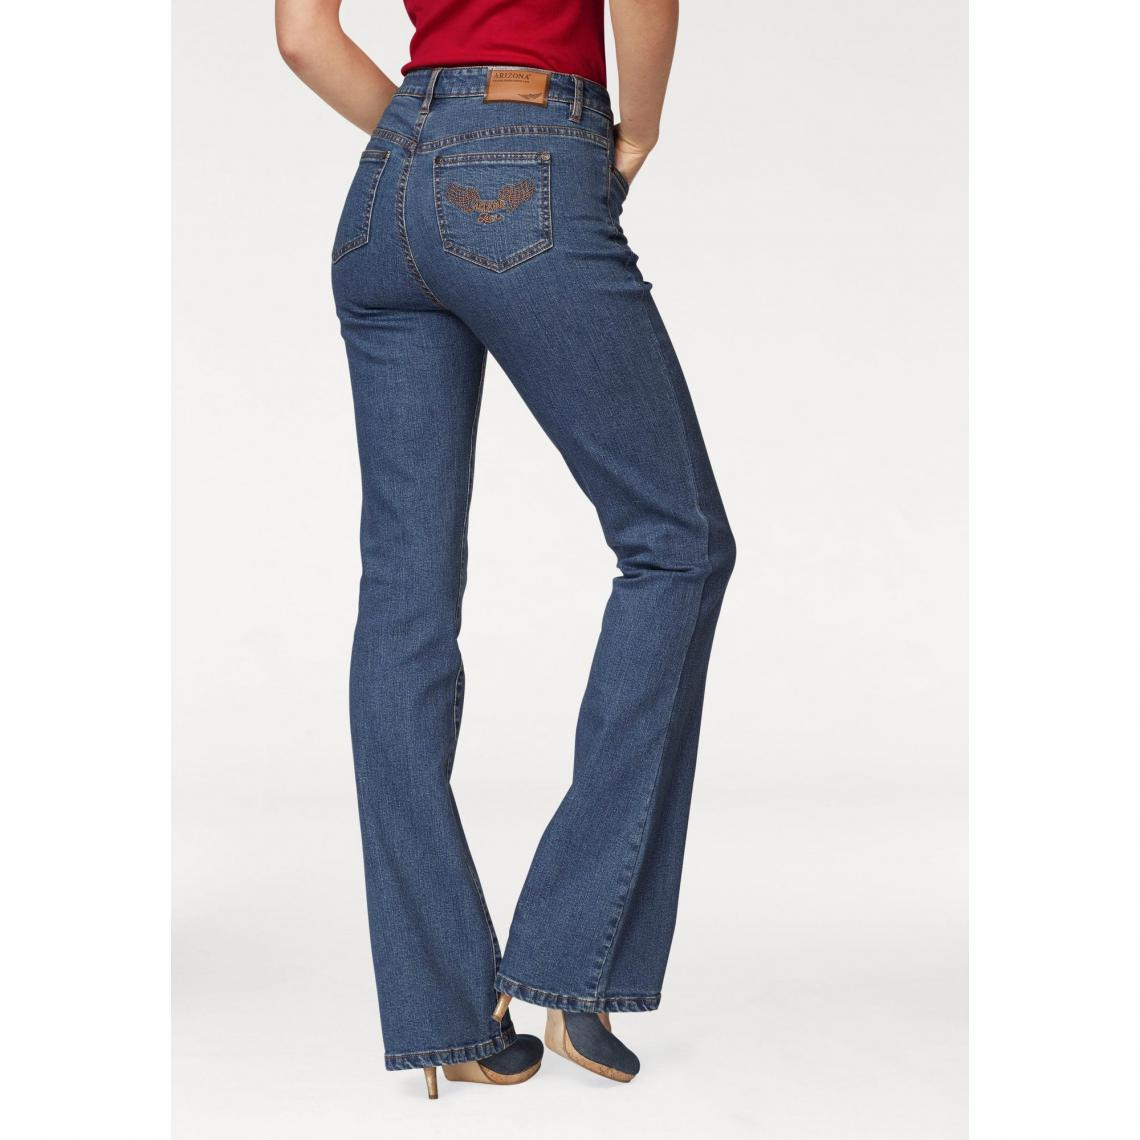 0cfd2c6388f8e Jean bootcut taille haute extra confort femme Arizona - Bleu Stone ...